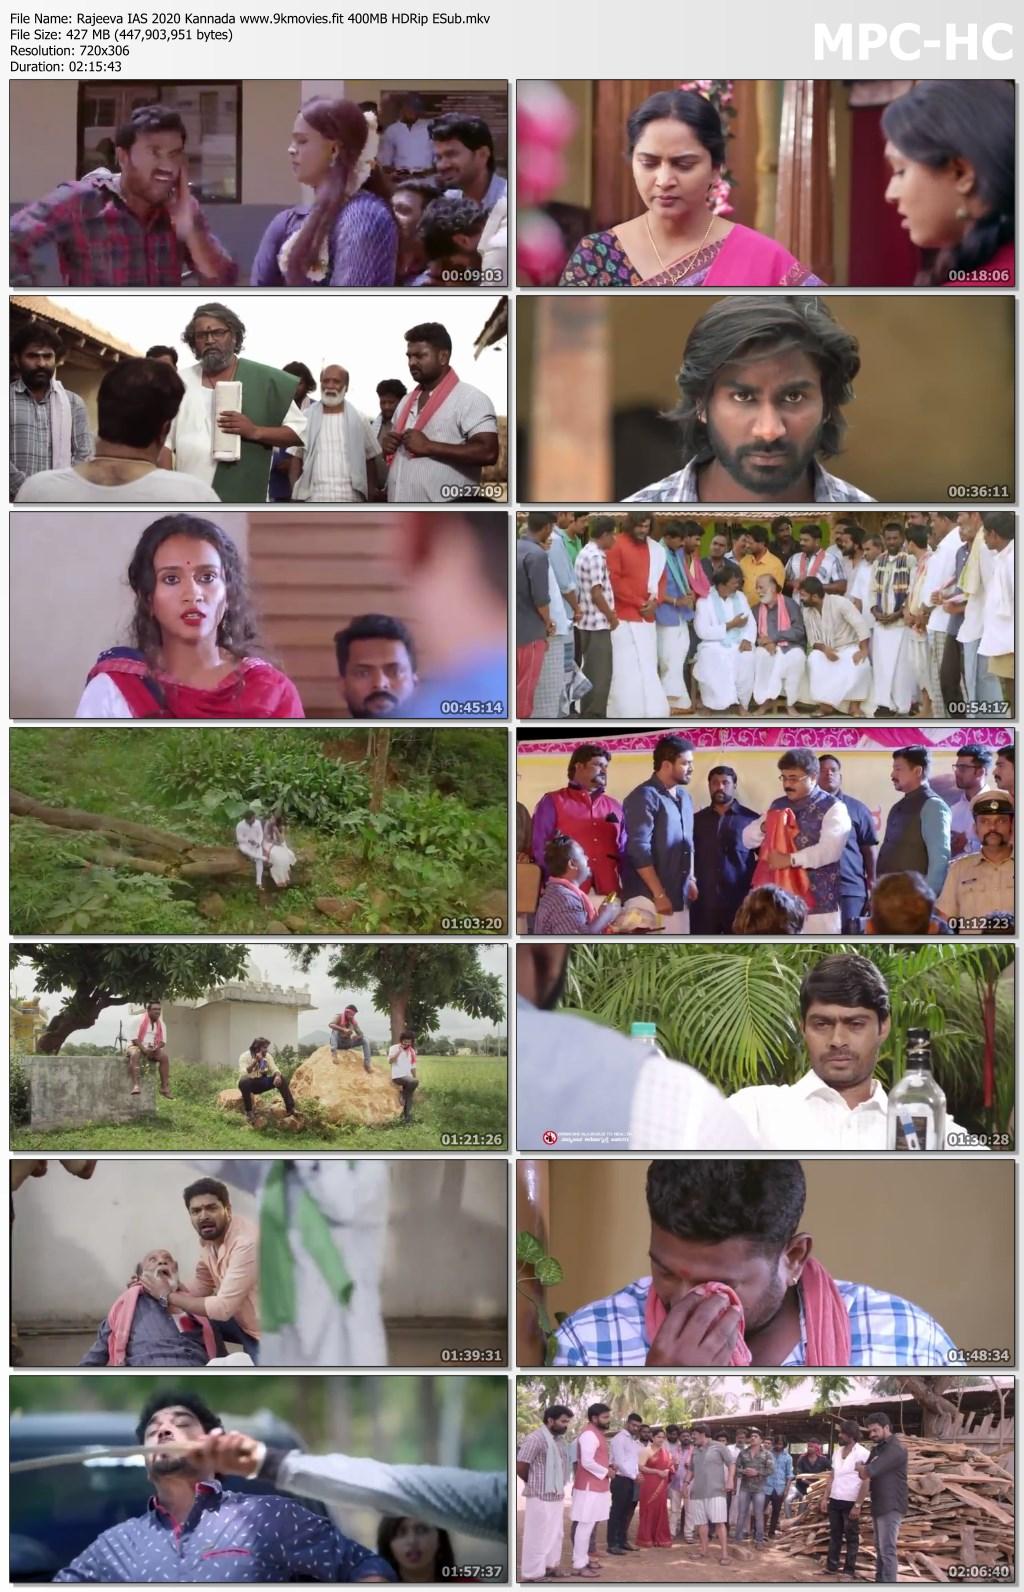 Rajeeva IAS 2020 Kannada 400MB HDRip ESub Download